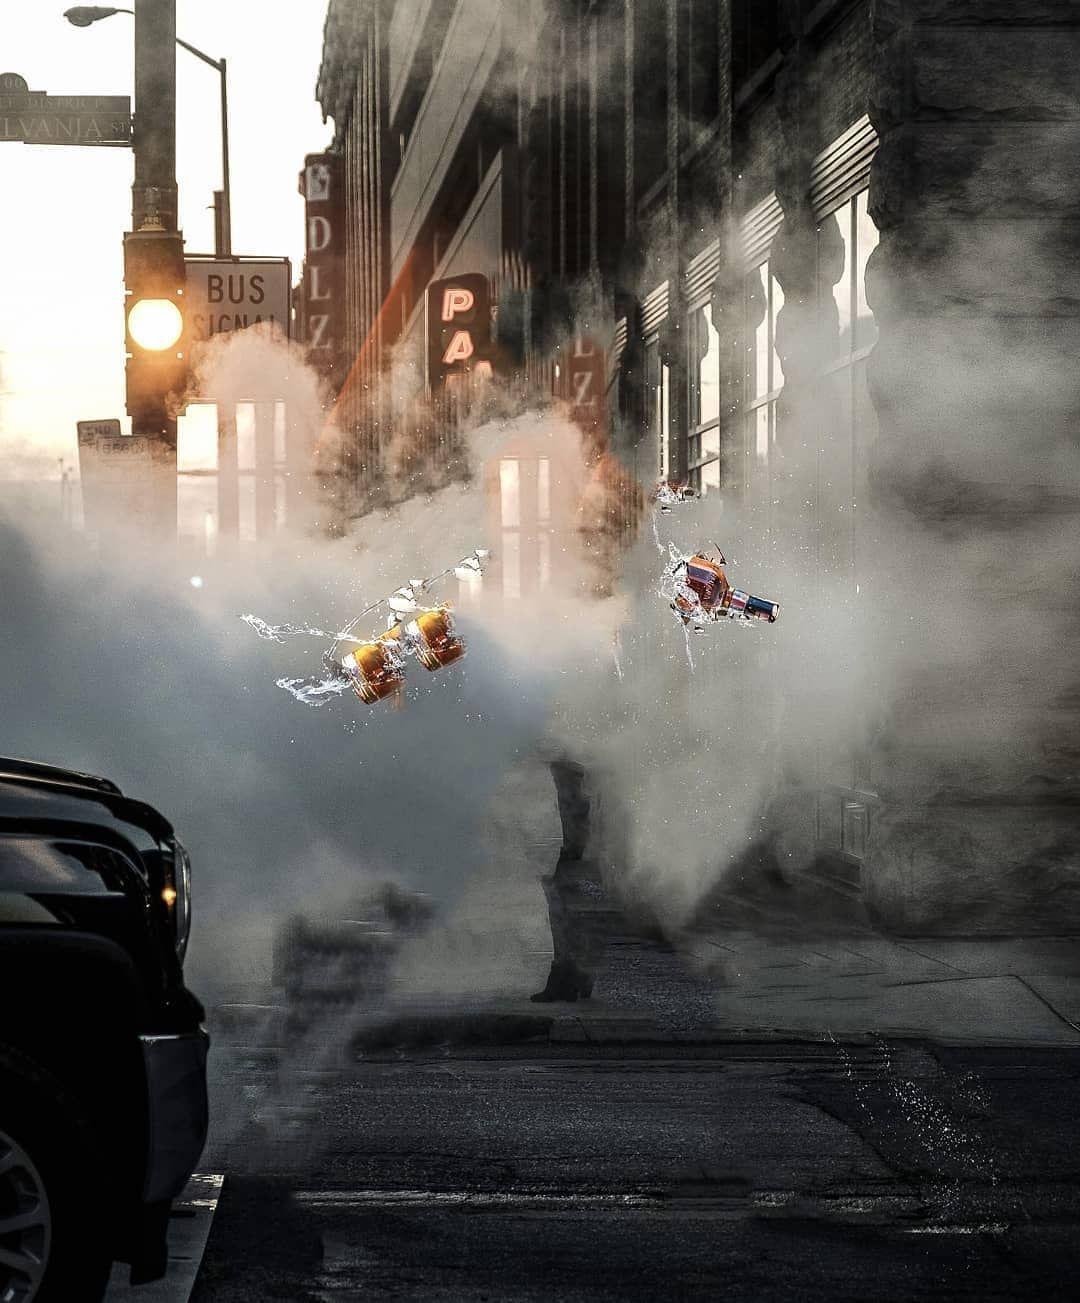 action movie background png vijaymahar #vijaymahar #photography #photooftheday #photo